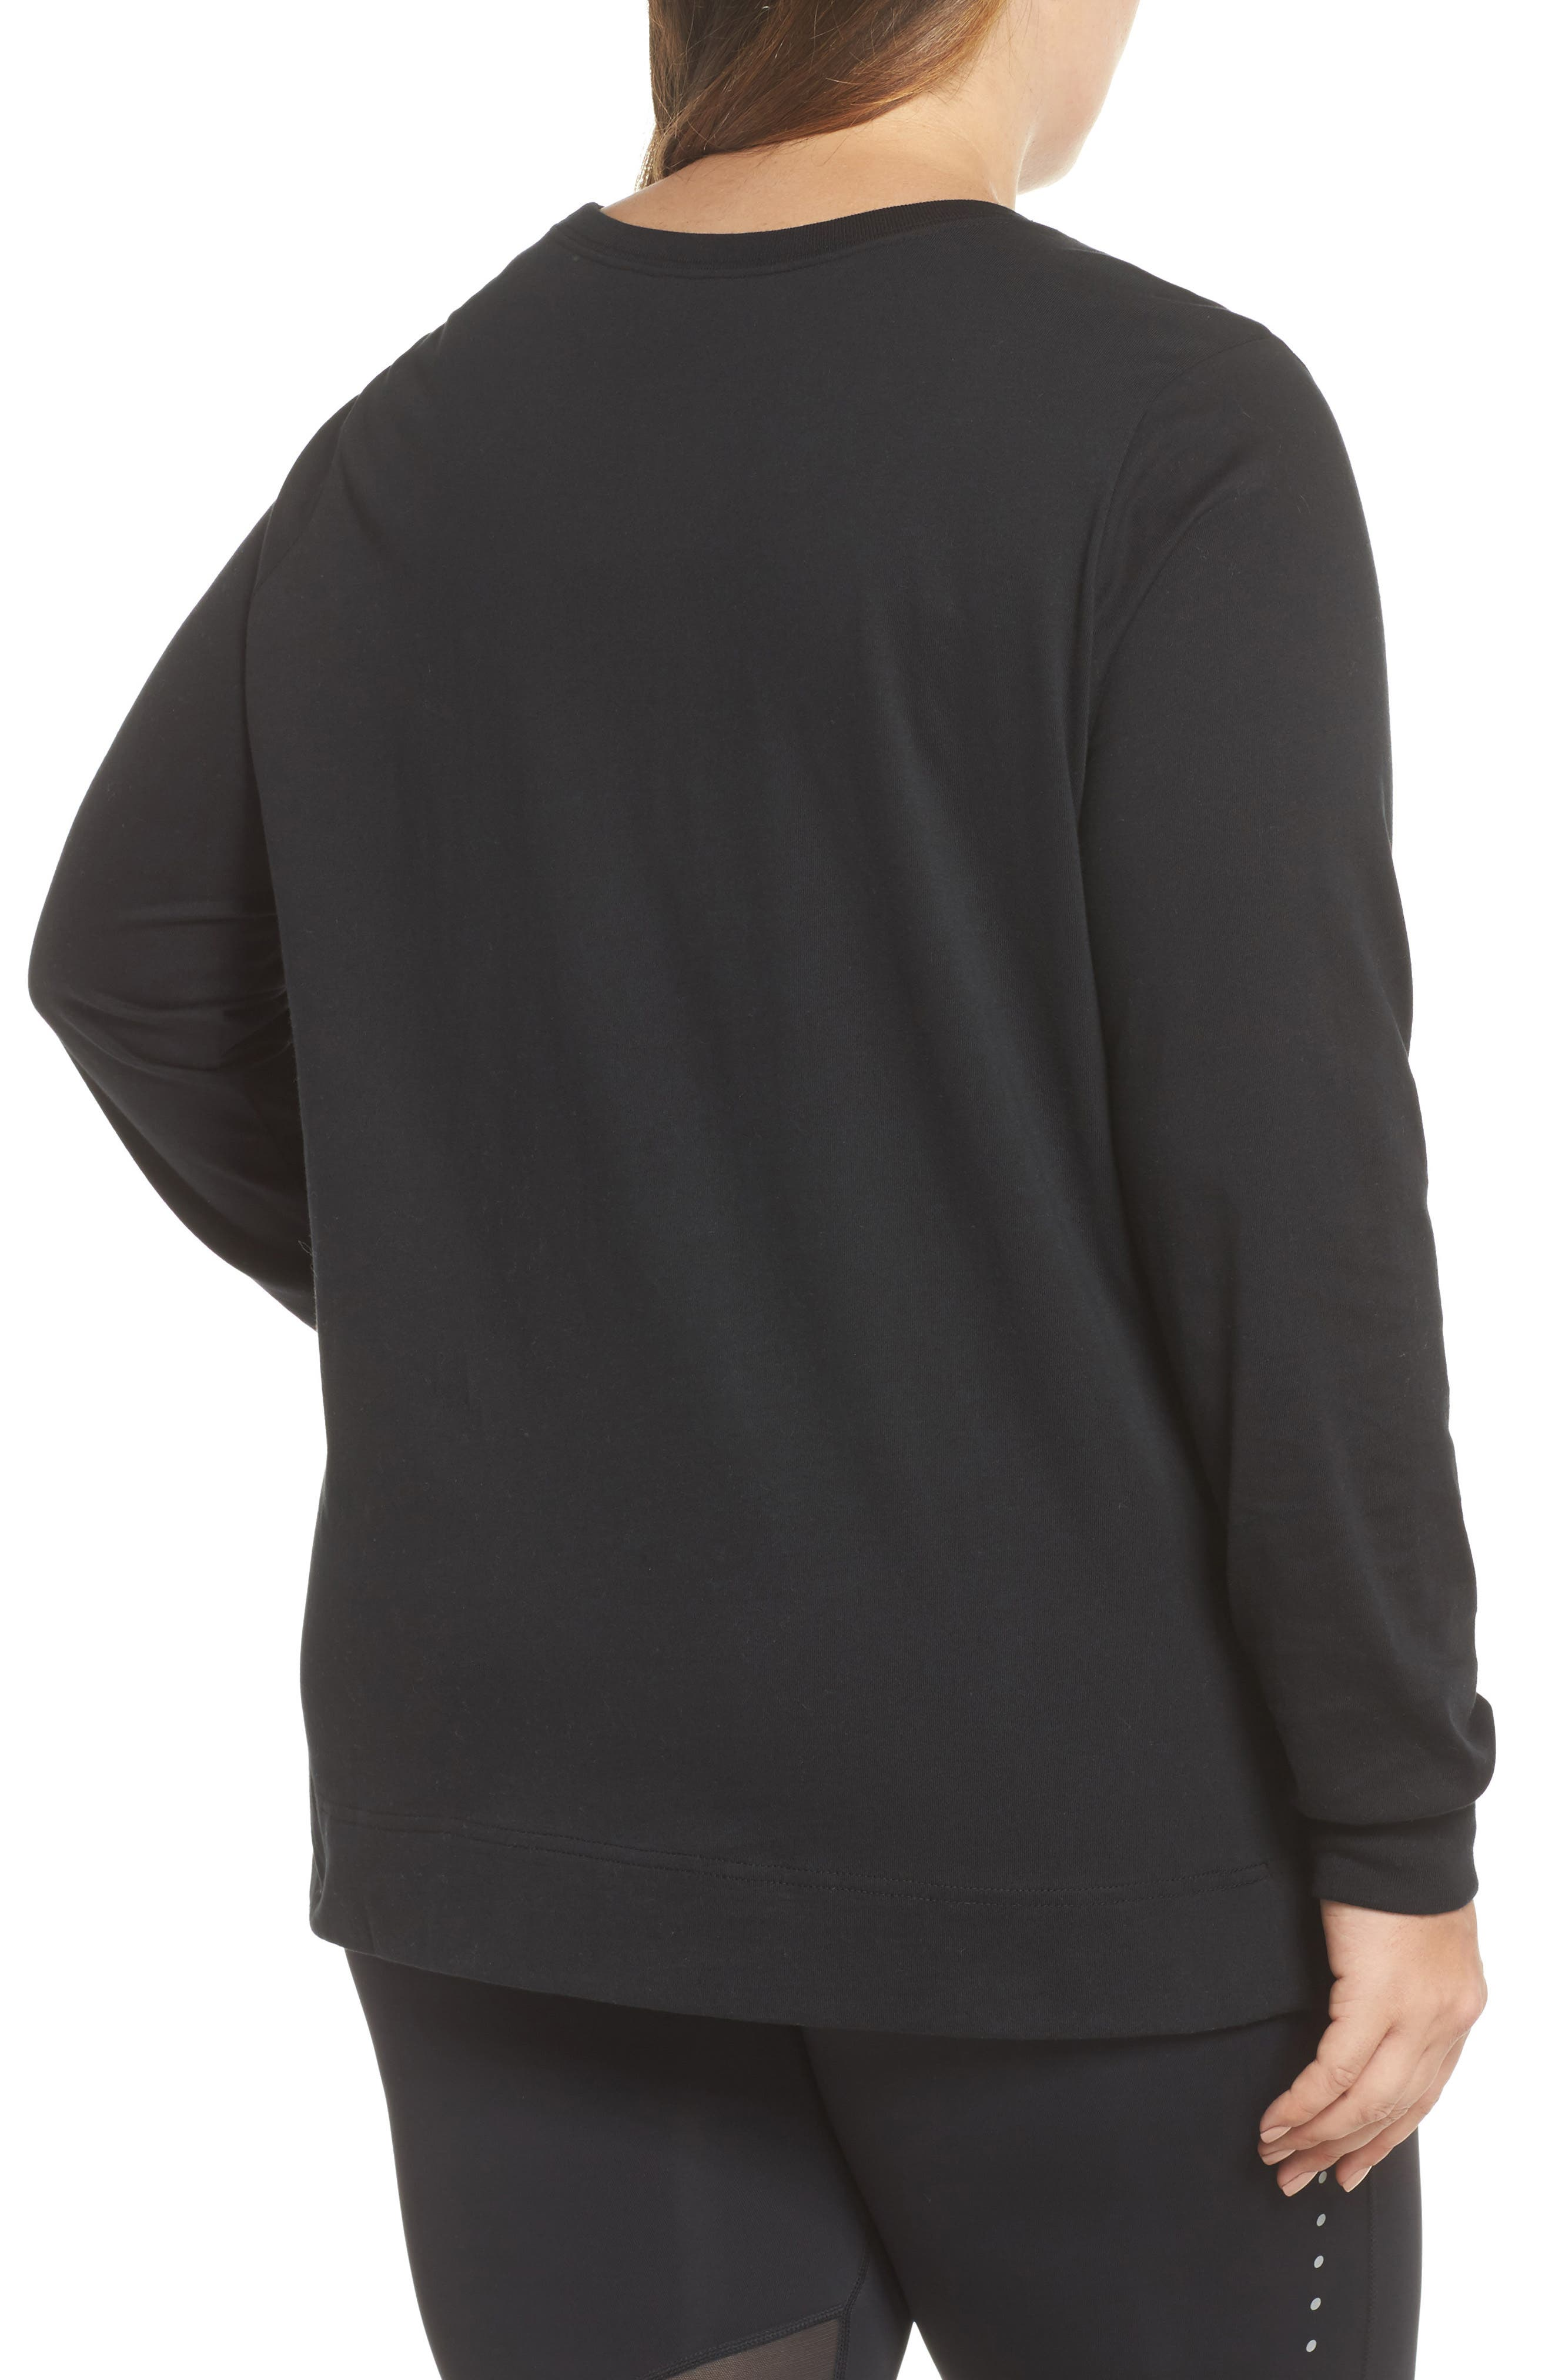 Sportswear Long Sleeve Tee,                             Alternate thumbnail 2, color,                             Black/ White